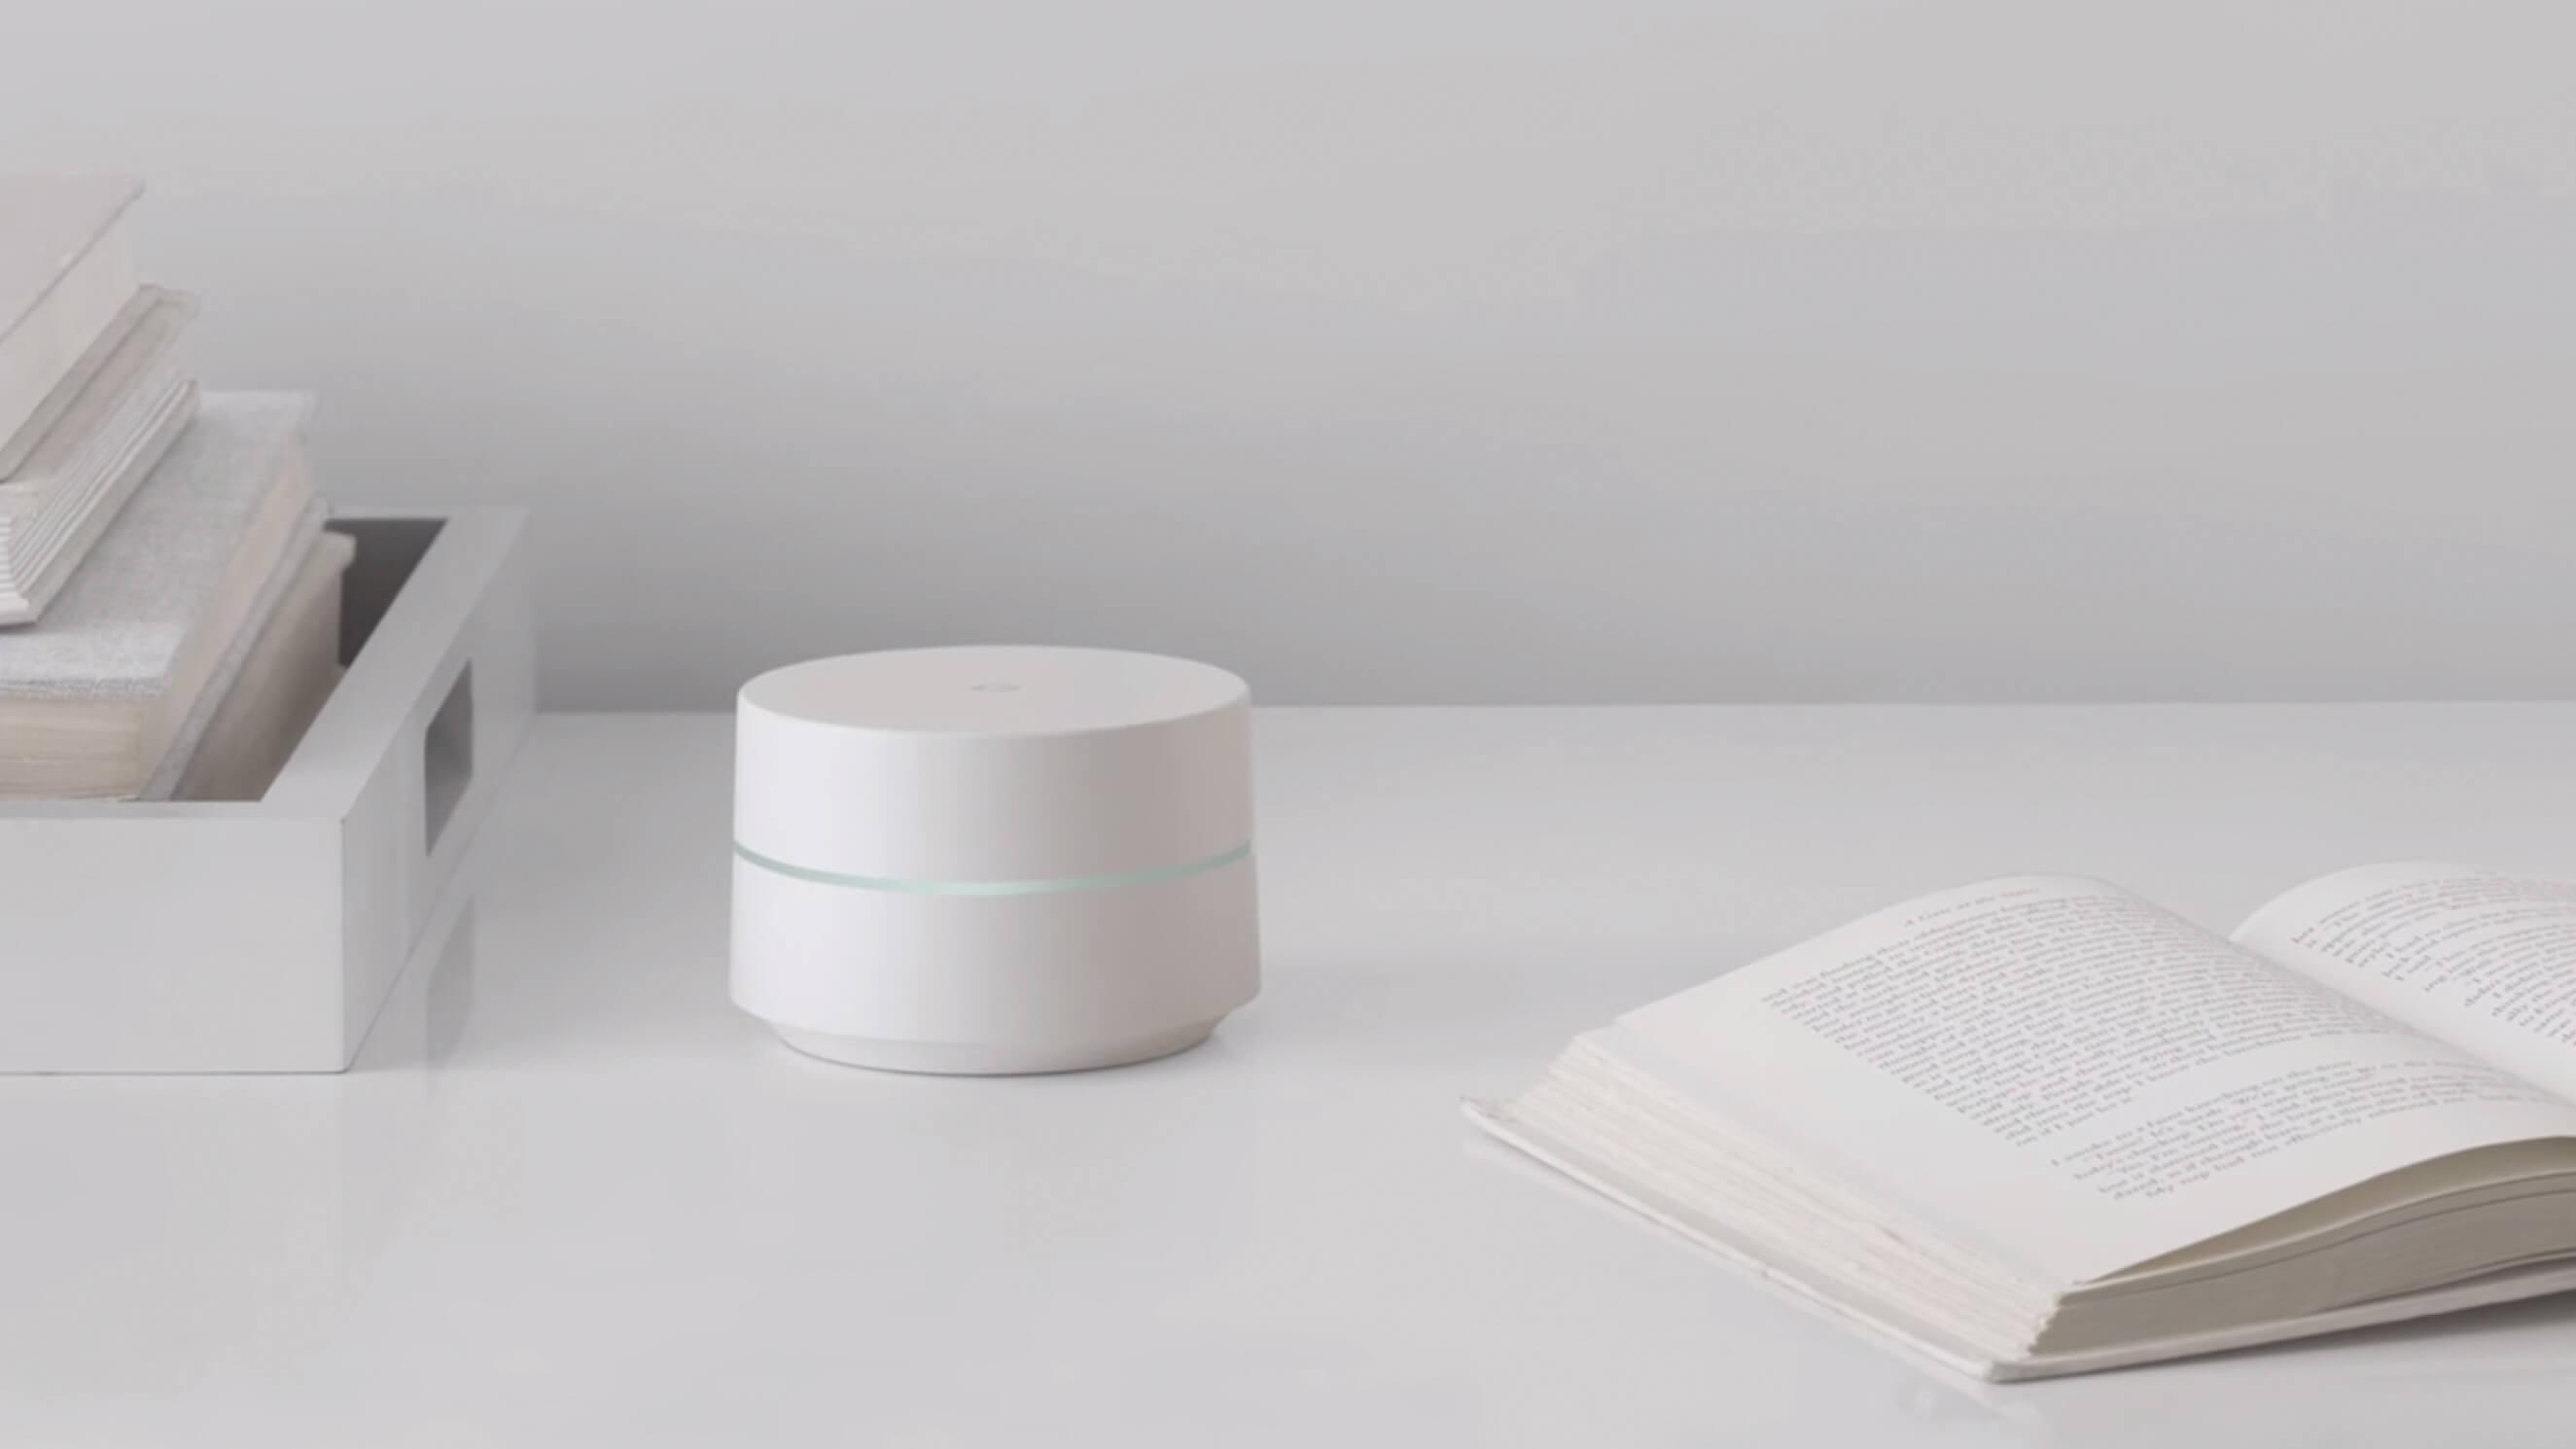 Pldt Google Wifi Plan Noypigeeks